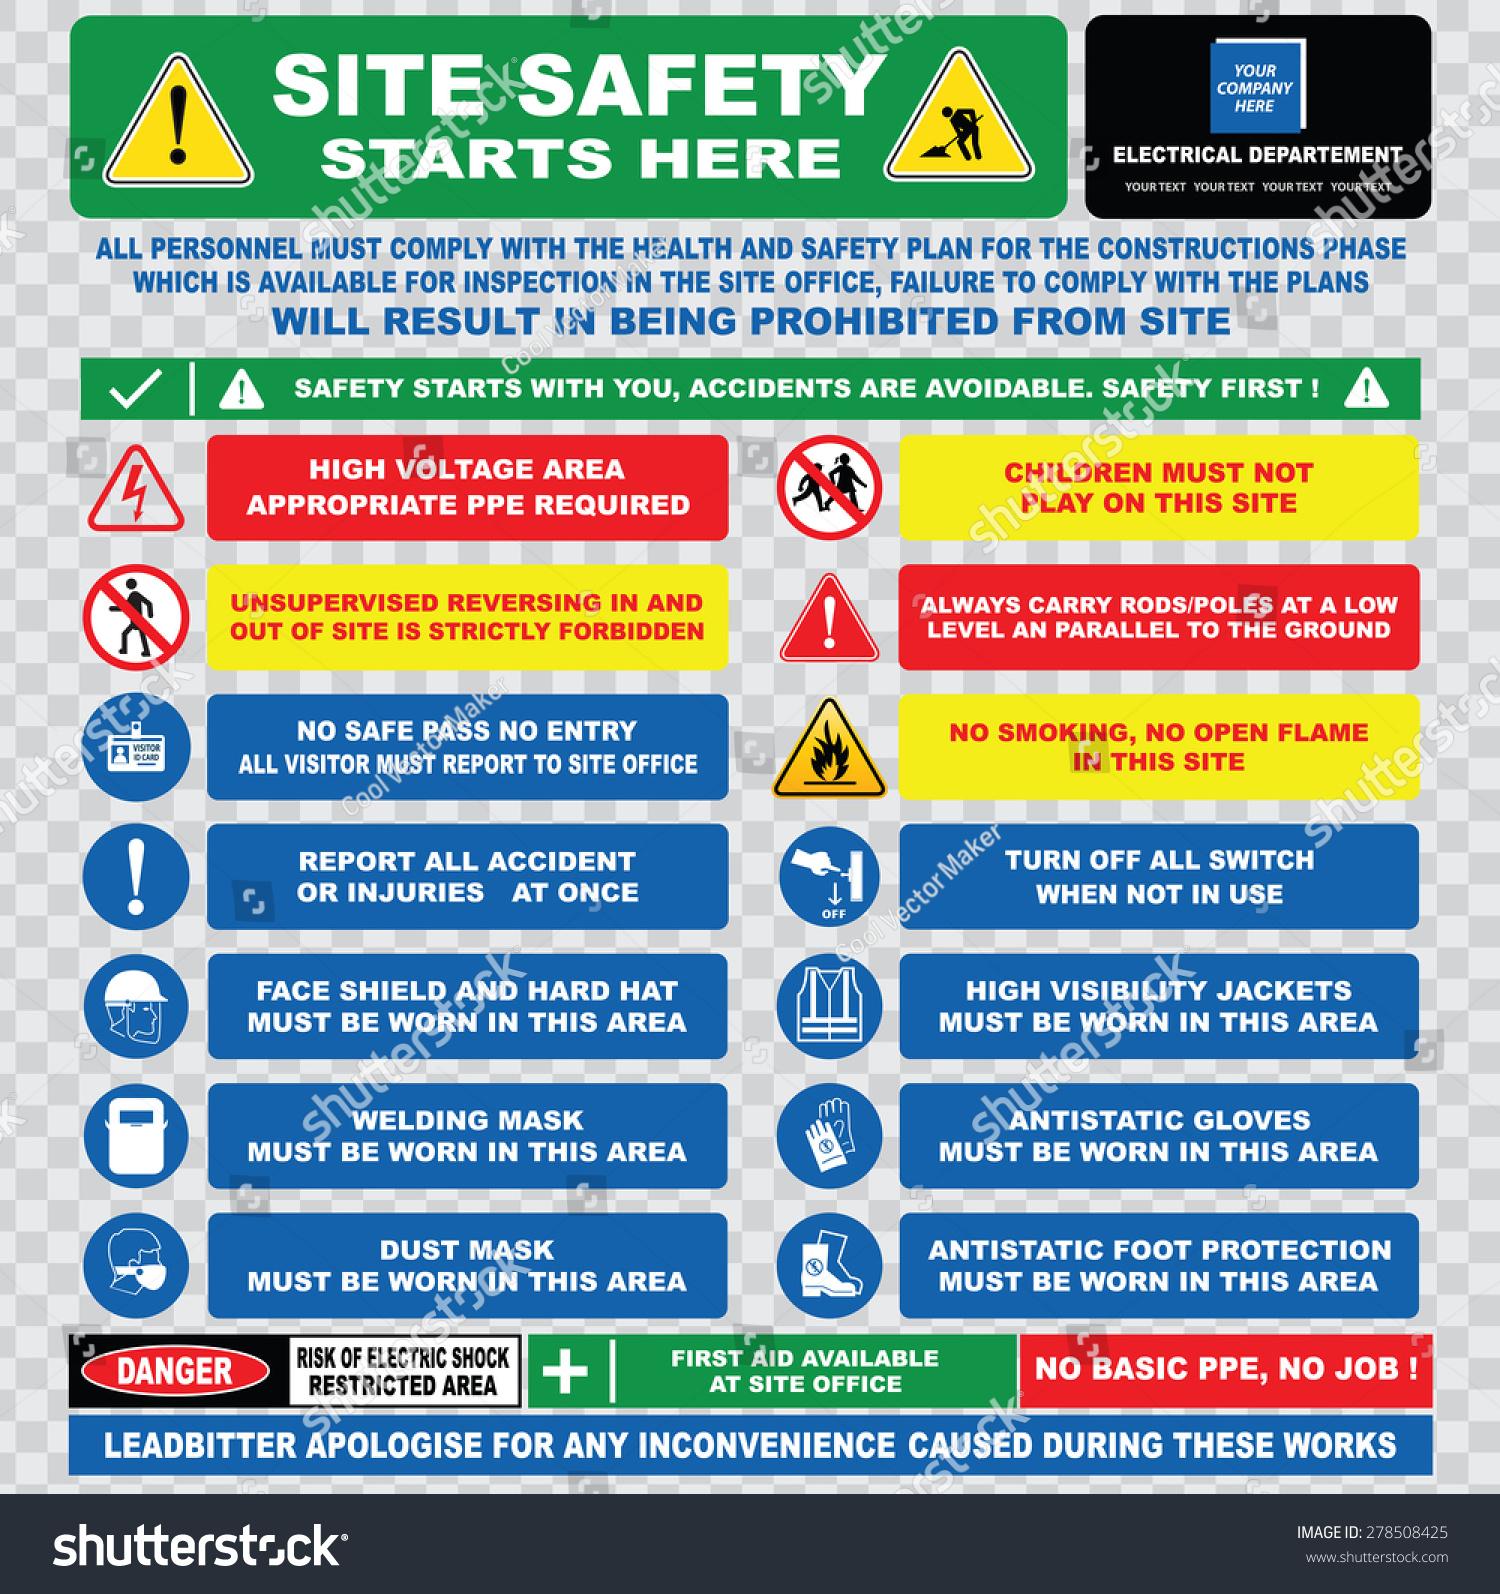 site safety starts here site safety stock vector 278508425 shutterstock. Black Bedroom Furniture Sets. Home Design Ideas